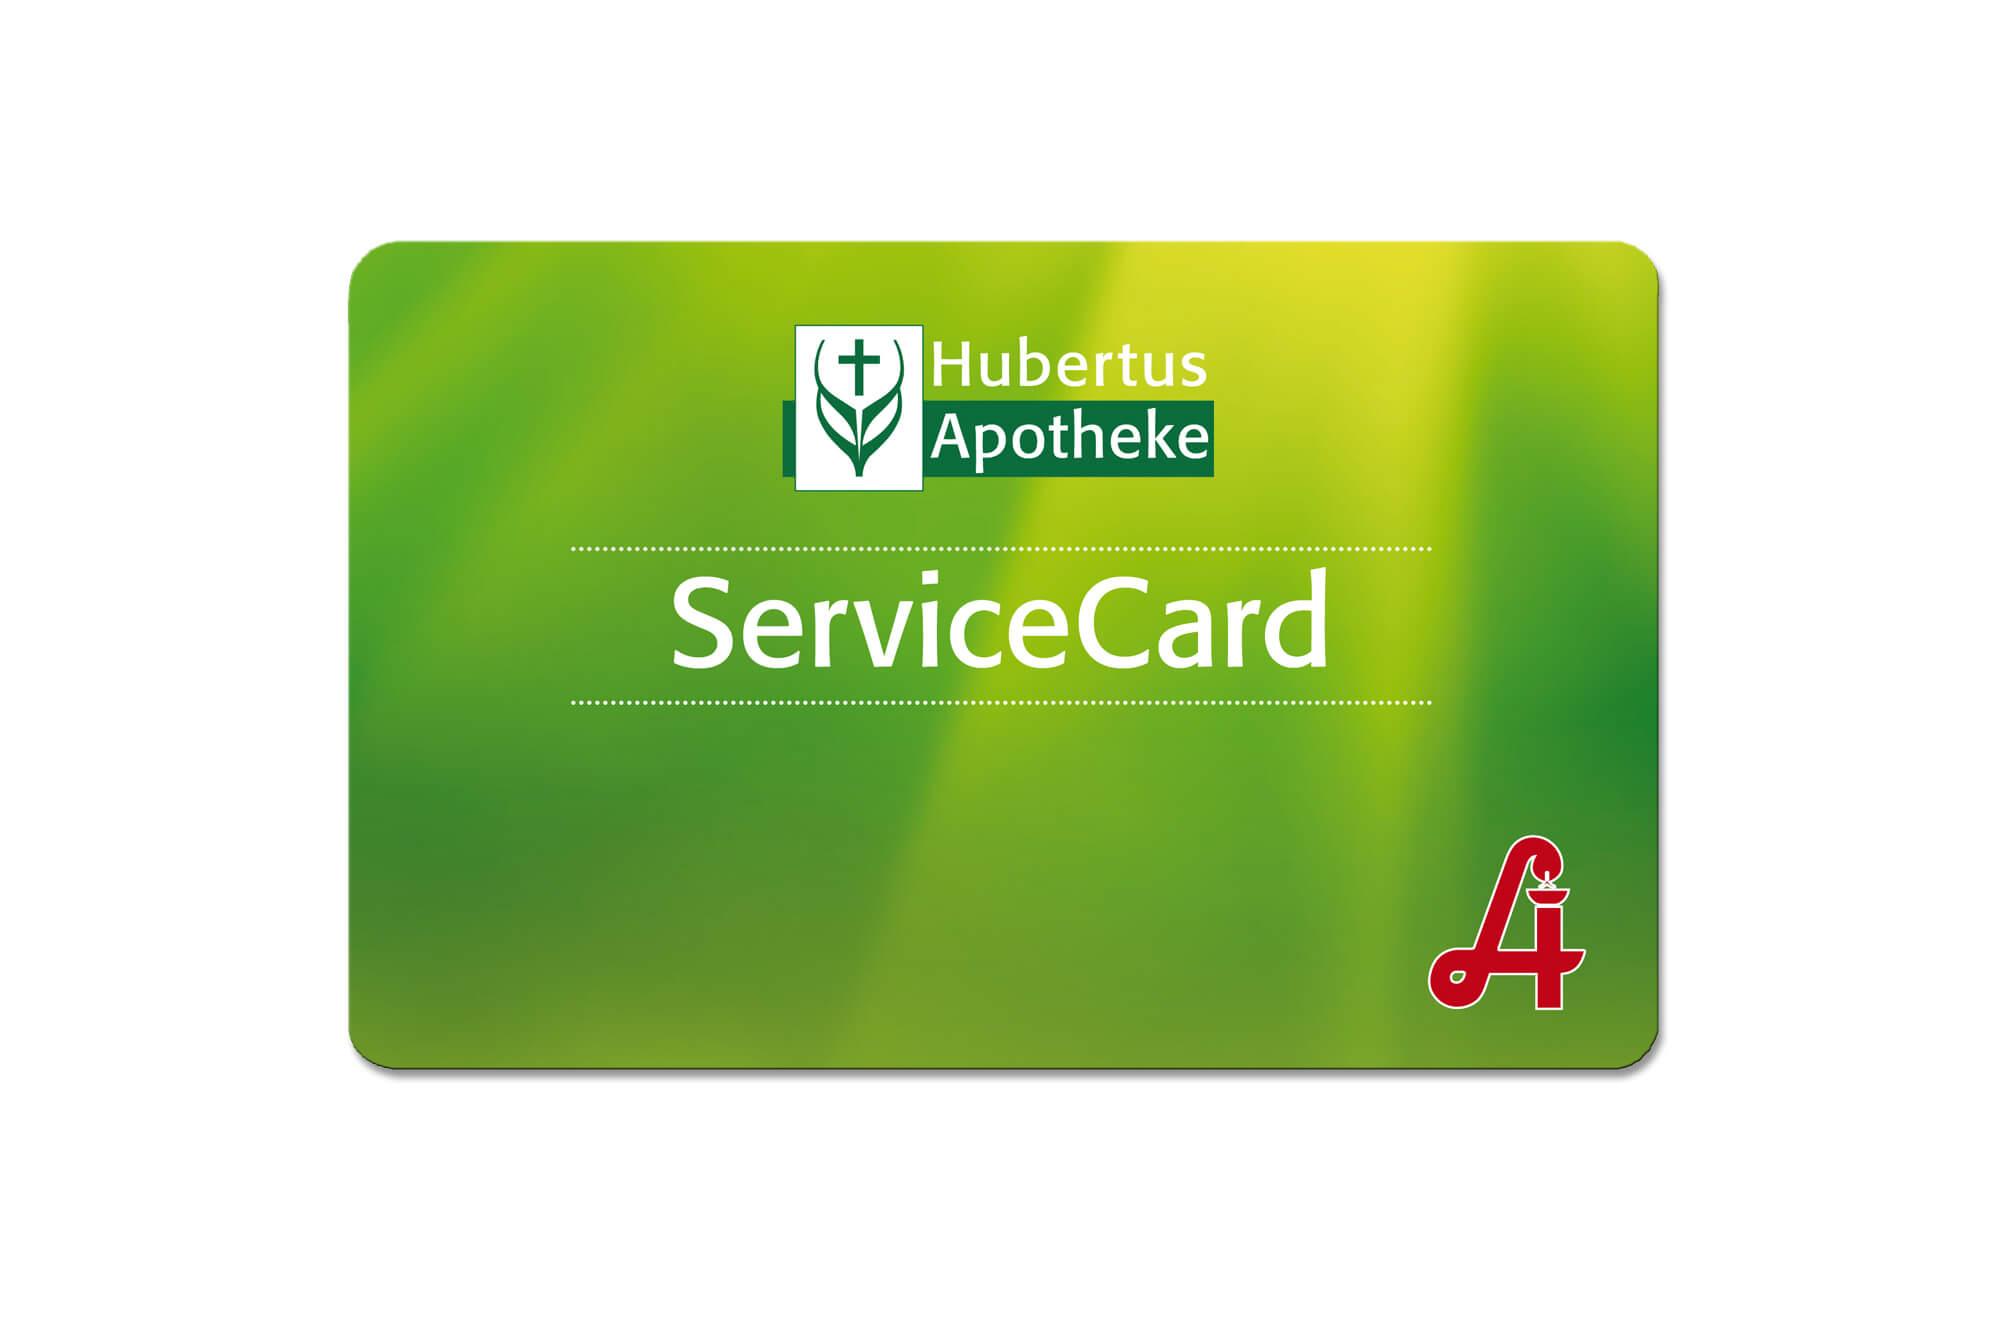 Apothekenkarte Service-Card Hubertus Apotheke